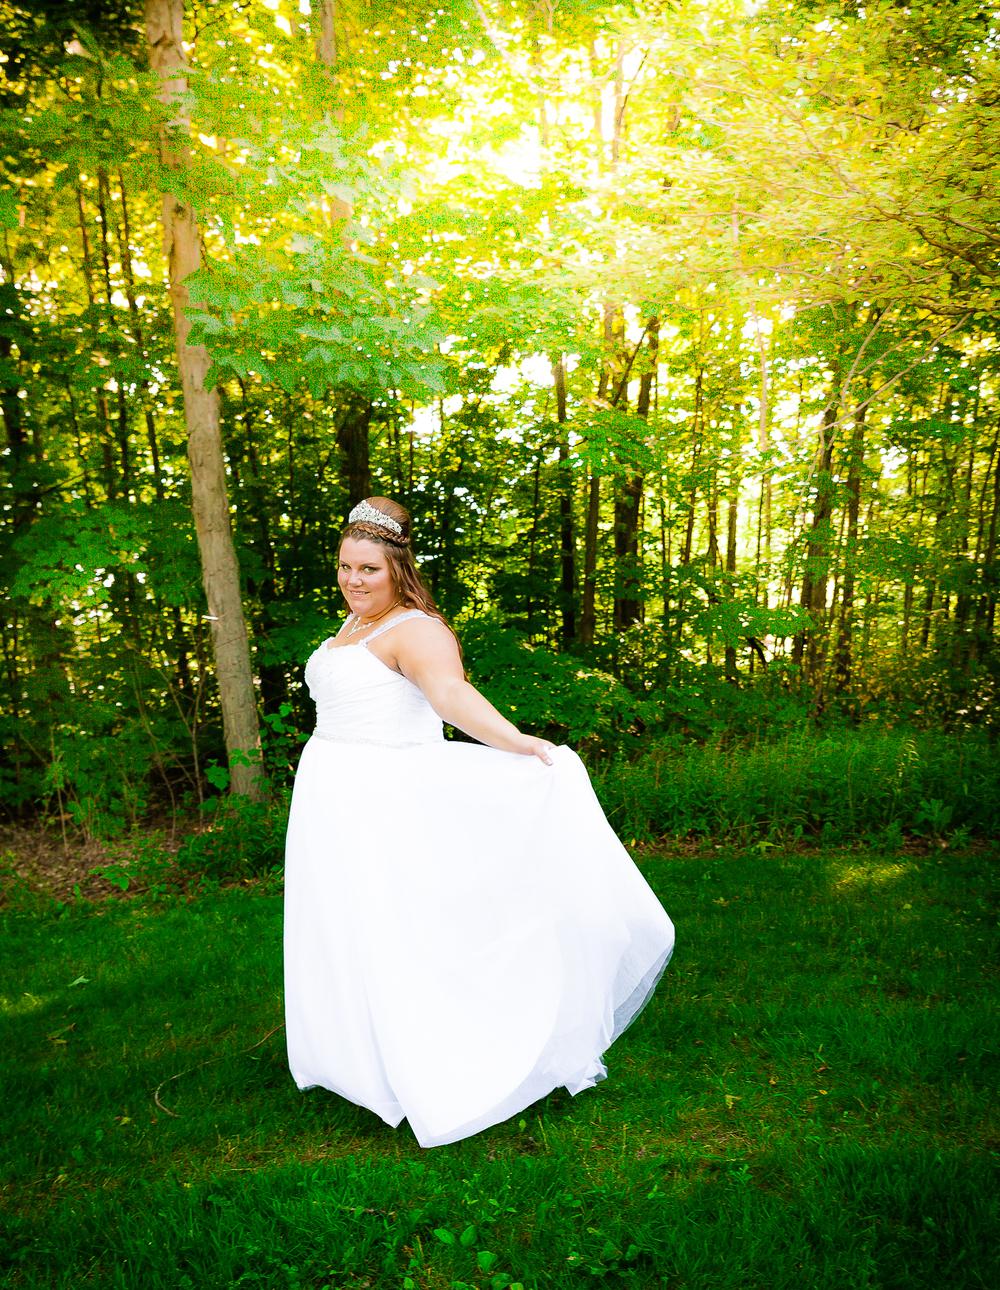 jenna + tony wedding blog (71 of 112).jpg